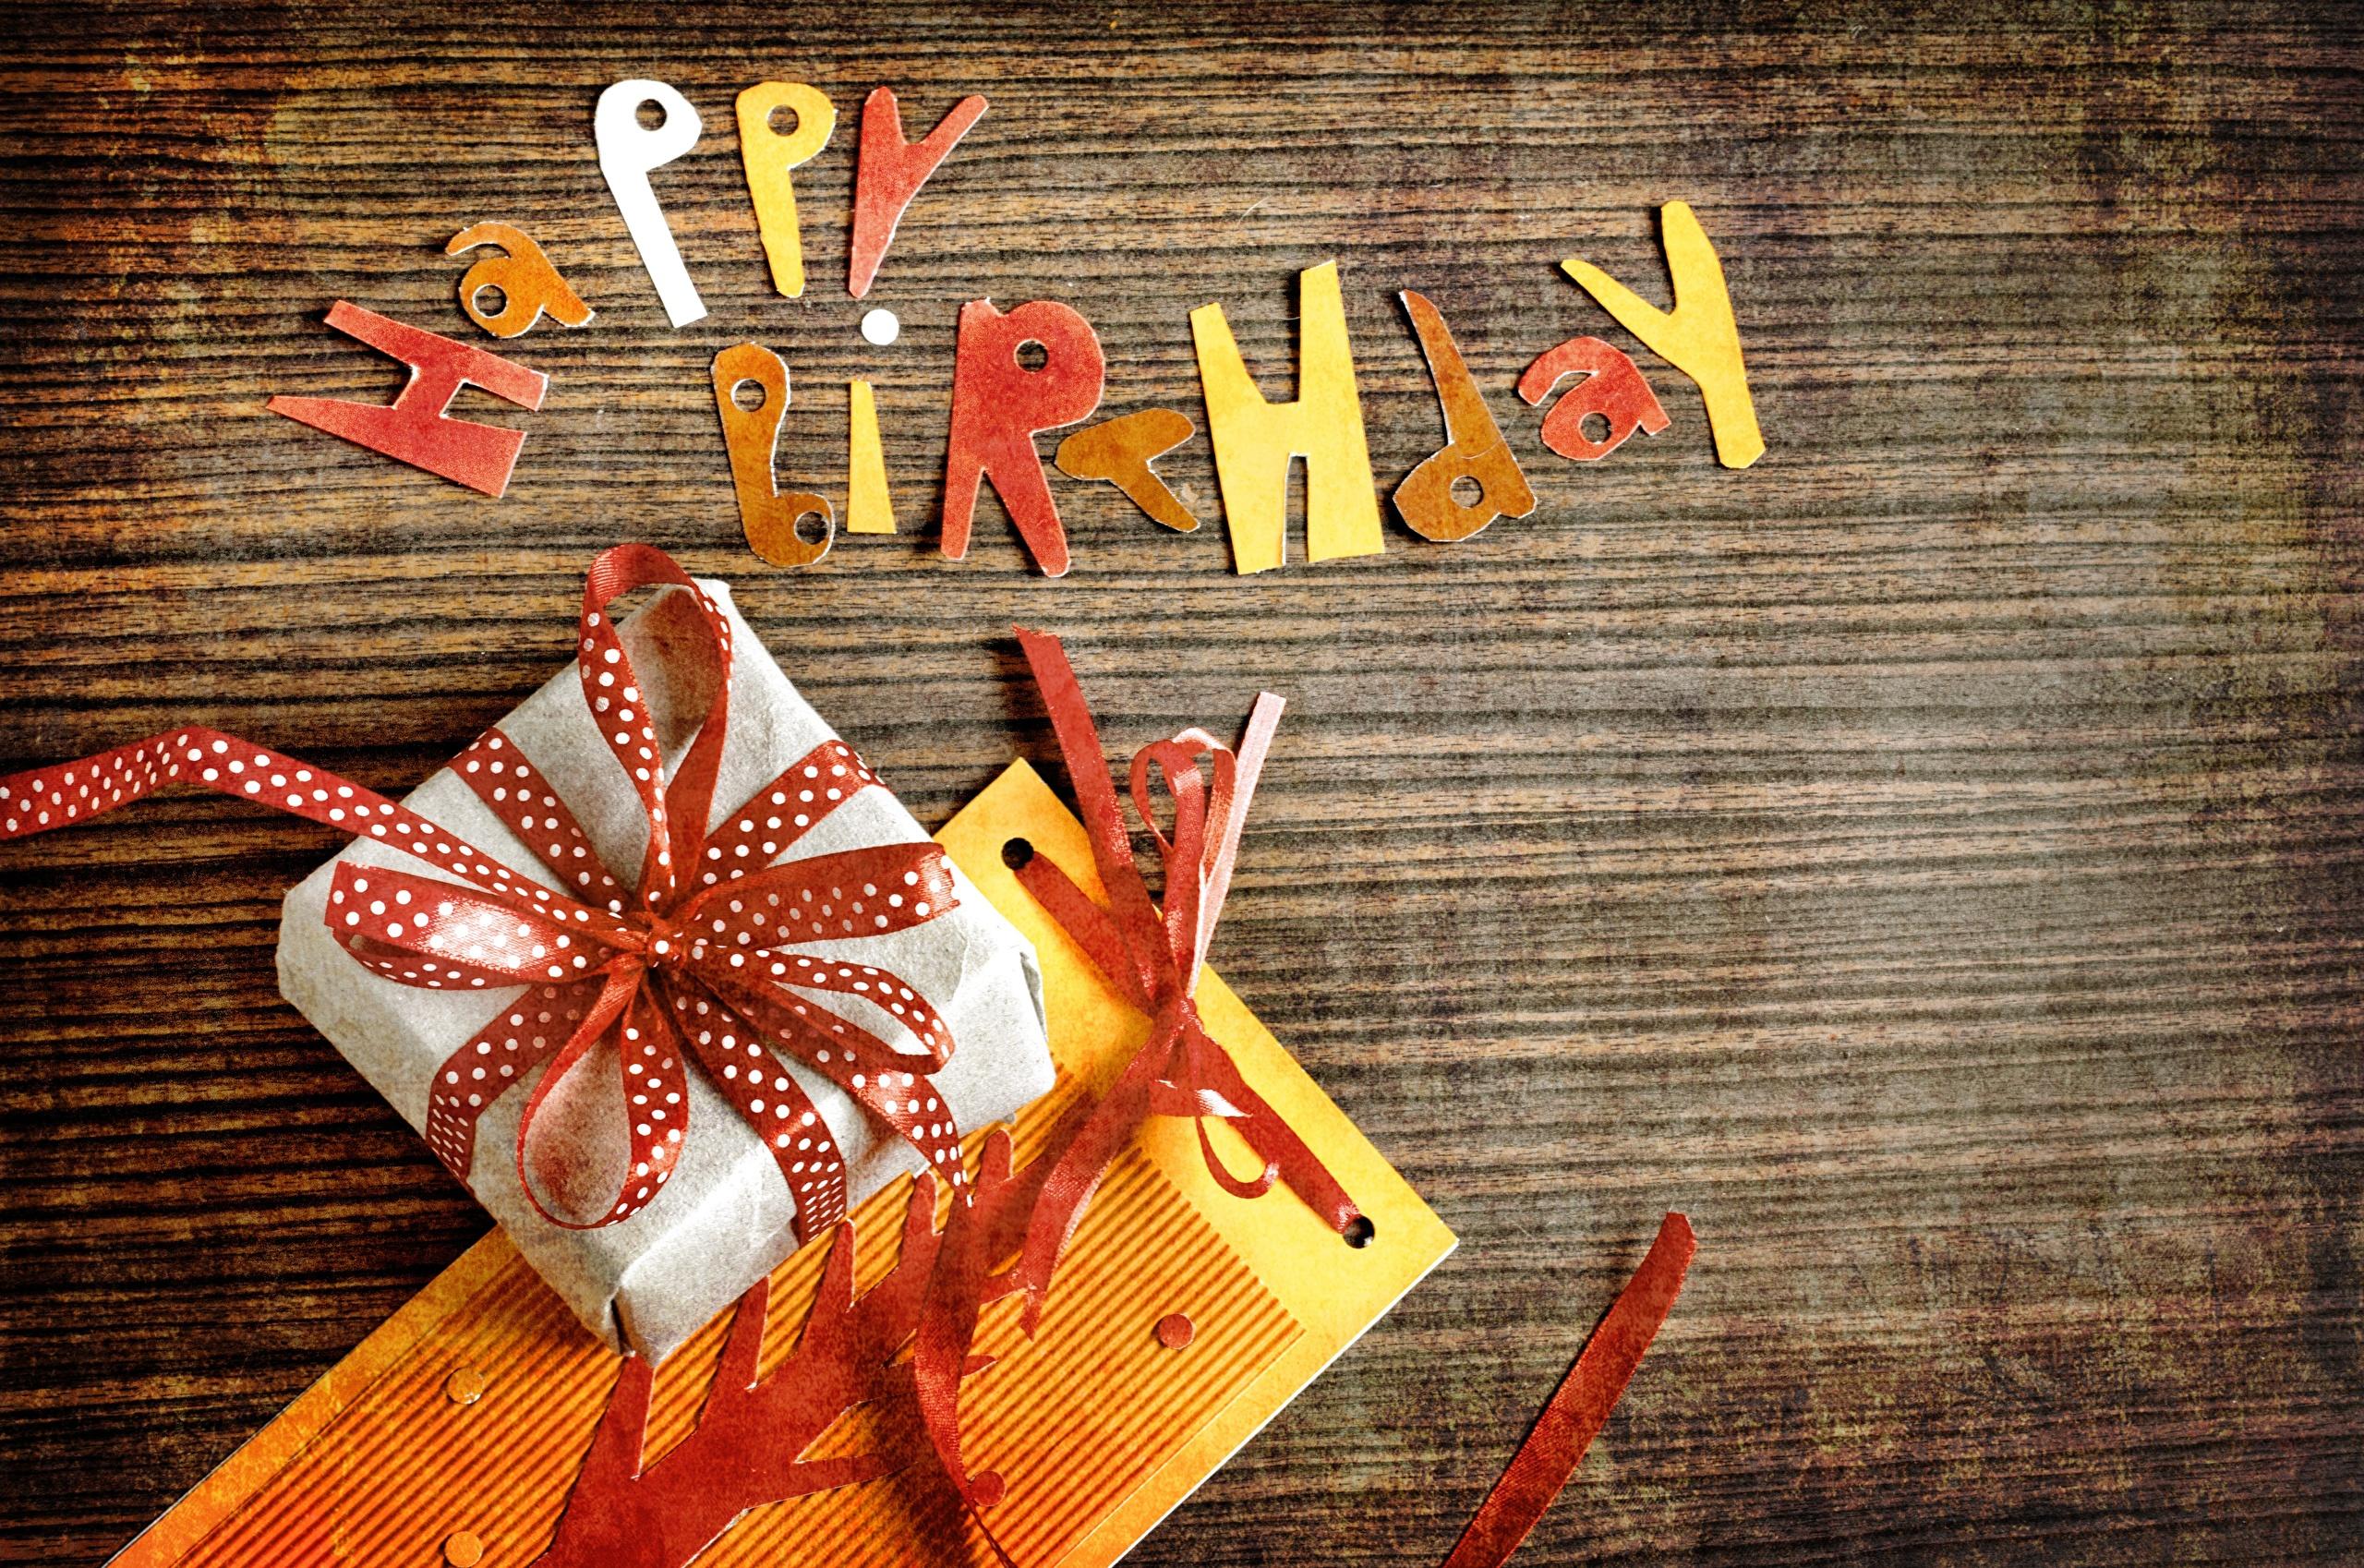 https://s1.1zoom.ru/big7/302/Birthday_Holidays_Gifts_361998.jpg